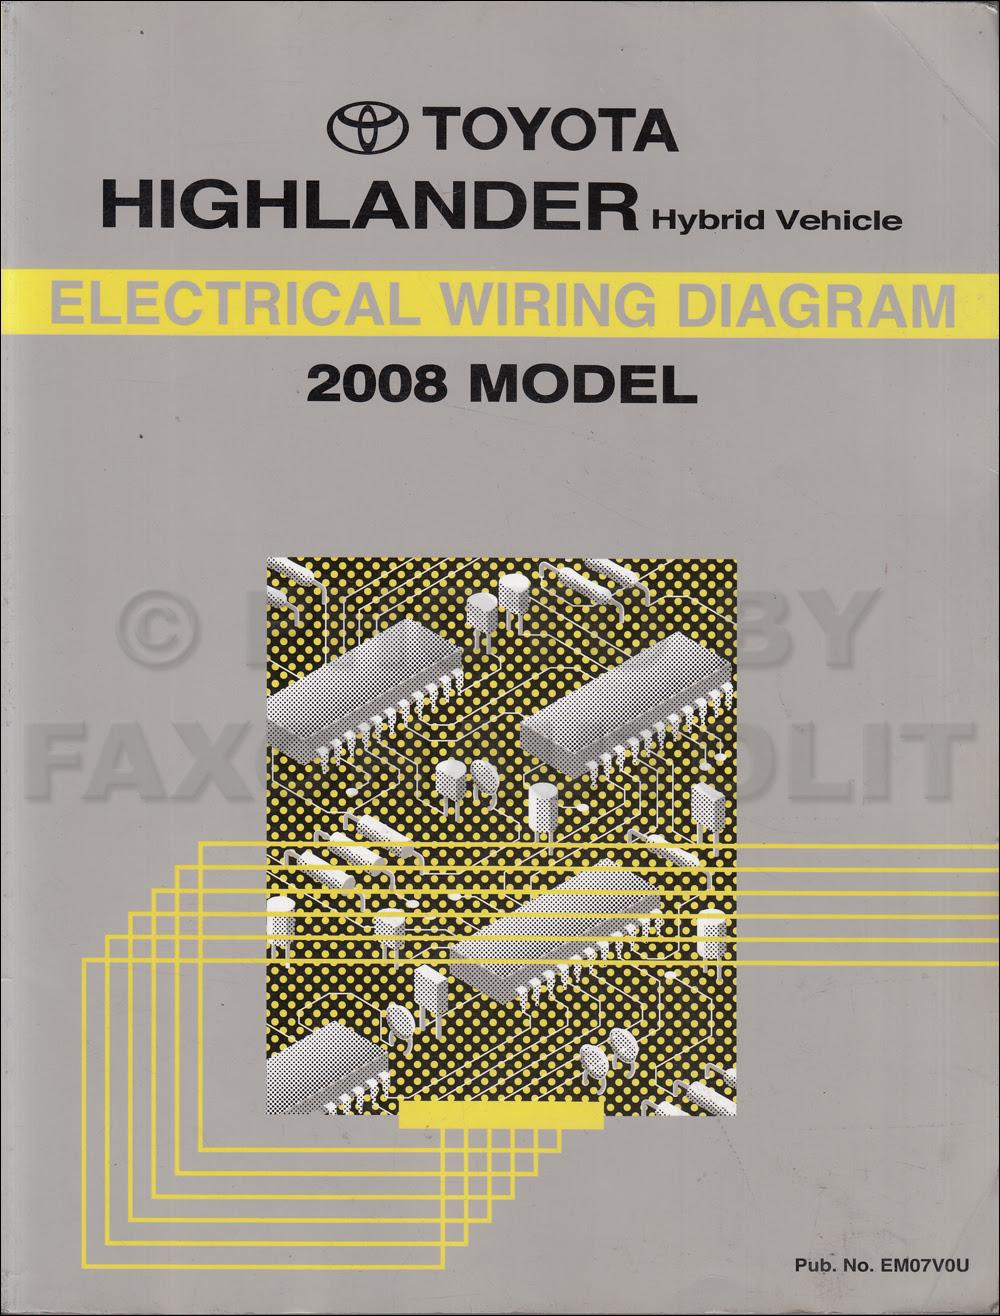 Diagram 2009 Toyota Highlander Hybrid Wiring Diagram Original Hybrid Full Version Hd Quality Original Hybrid Venndiagramblank Finkaboutit Fr